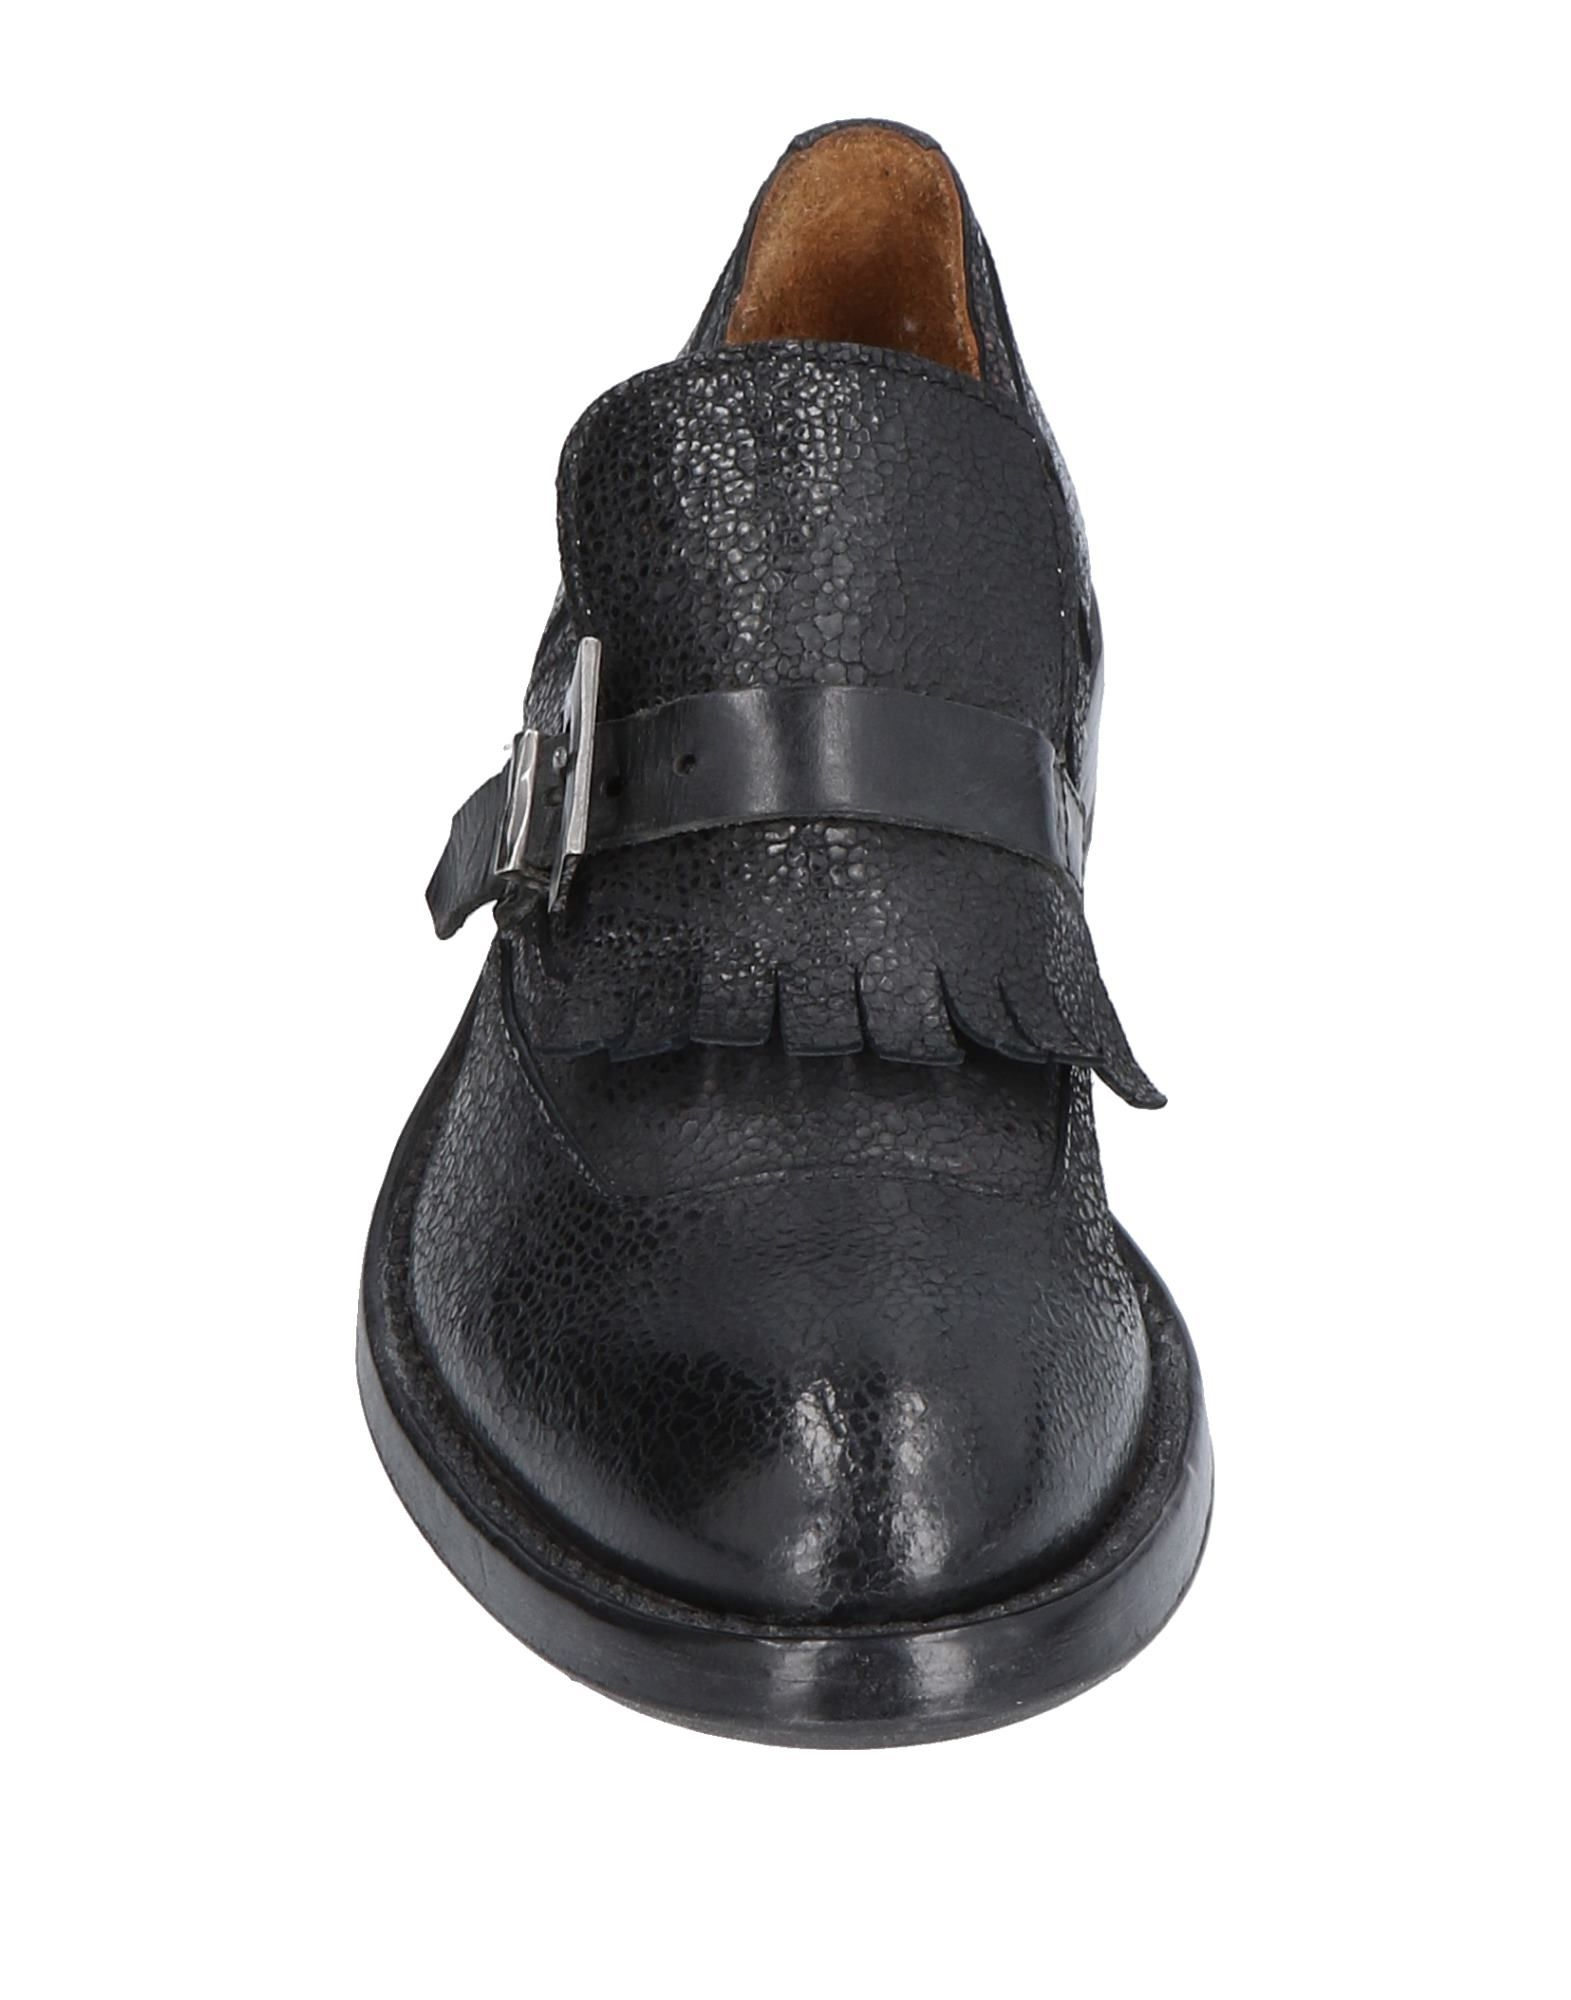 Moma Mokassins Damen  11498311NNGut aussehende strapazierfähige strapazierfähige strapazierfähige Schuhe f0c080